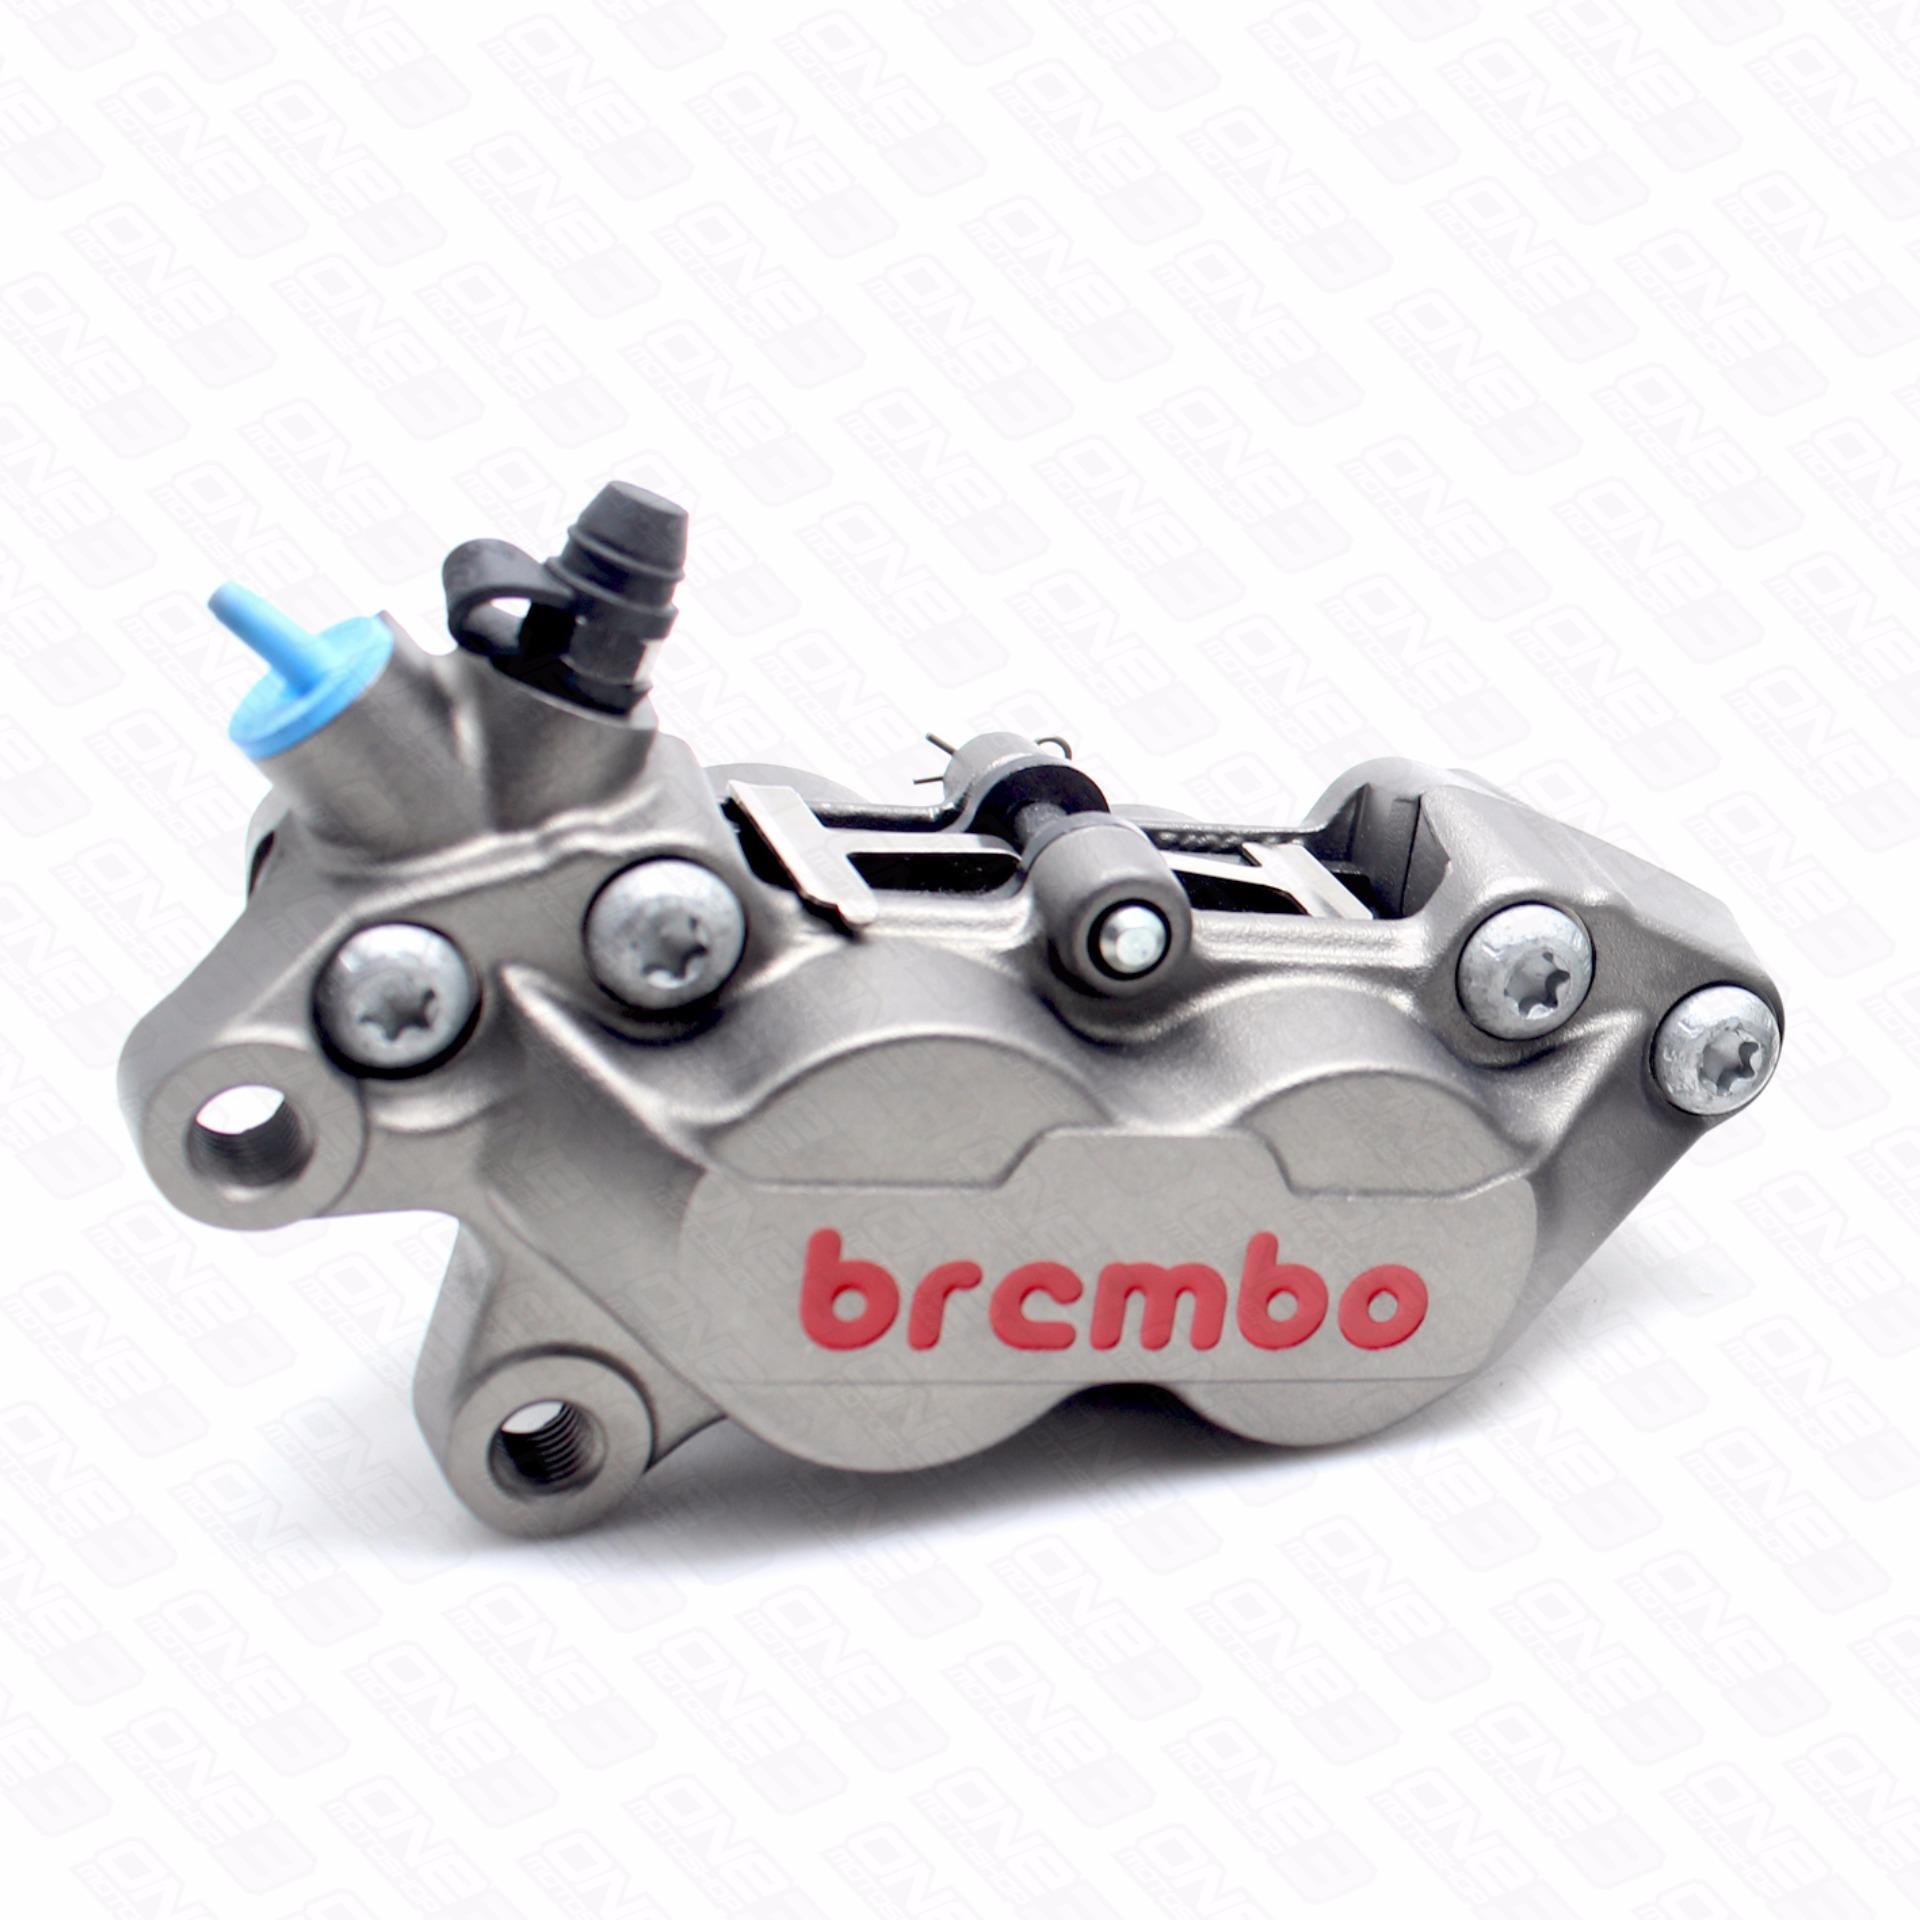 Pencari Harga Brembo Caliper P434 30 Grey Lhs Bandingkan Simpan Jas Hujan Messio Ventilator